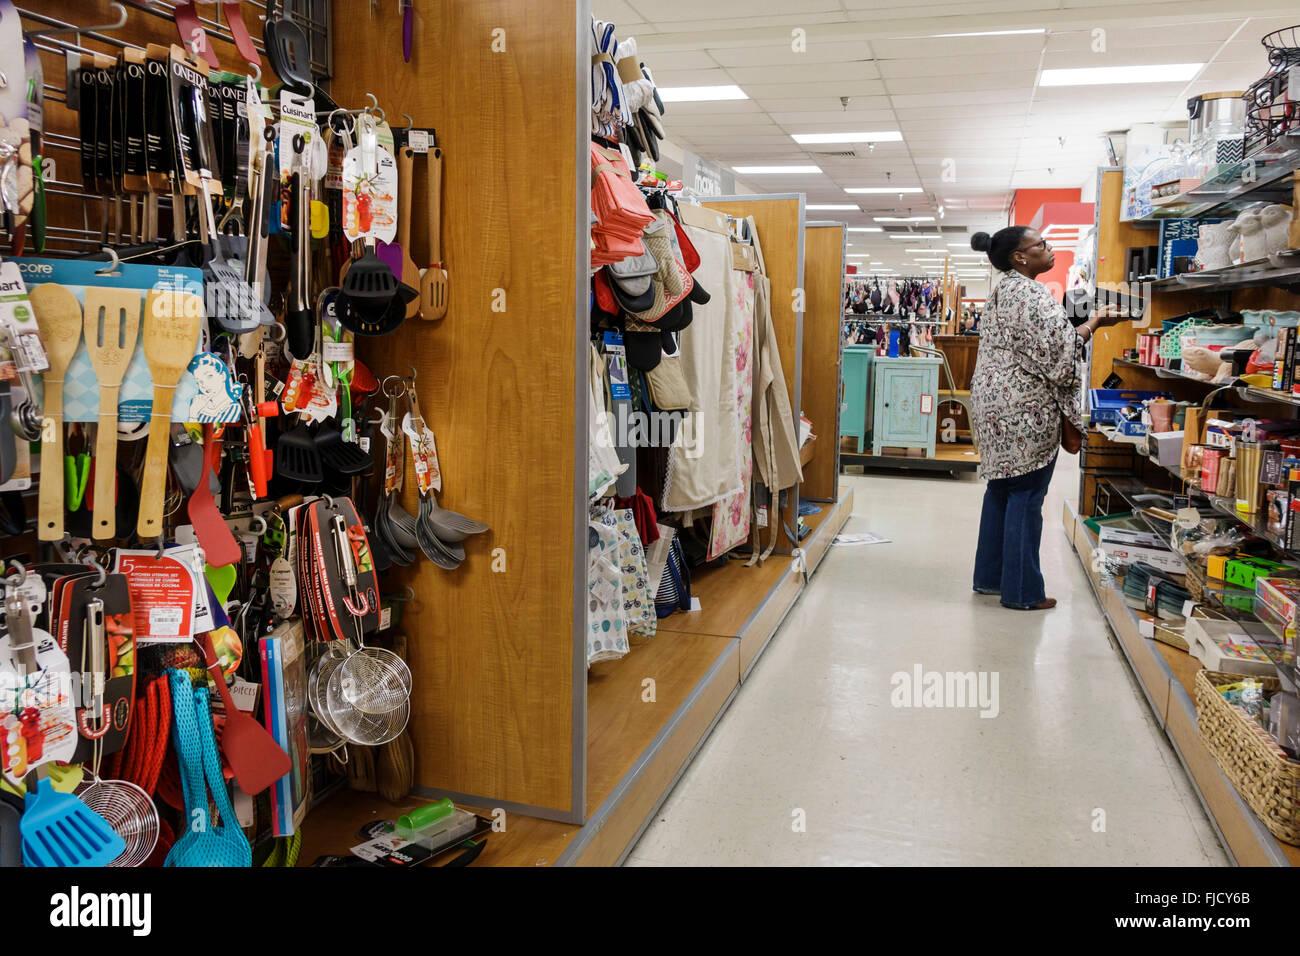 kitchen utensils store ikea countertop installation stock photos and